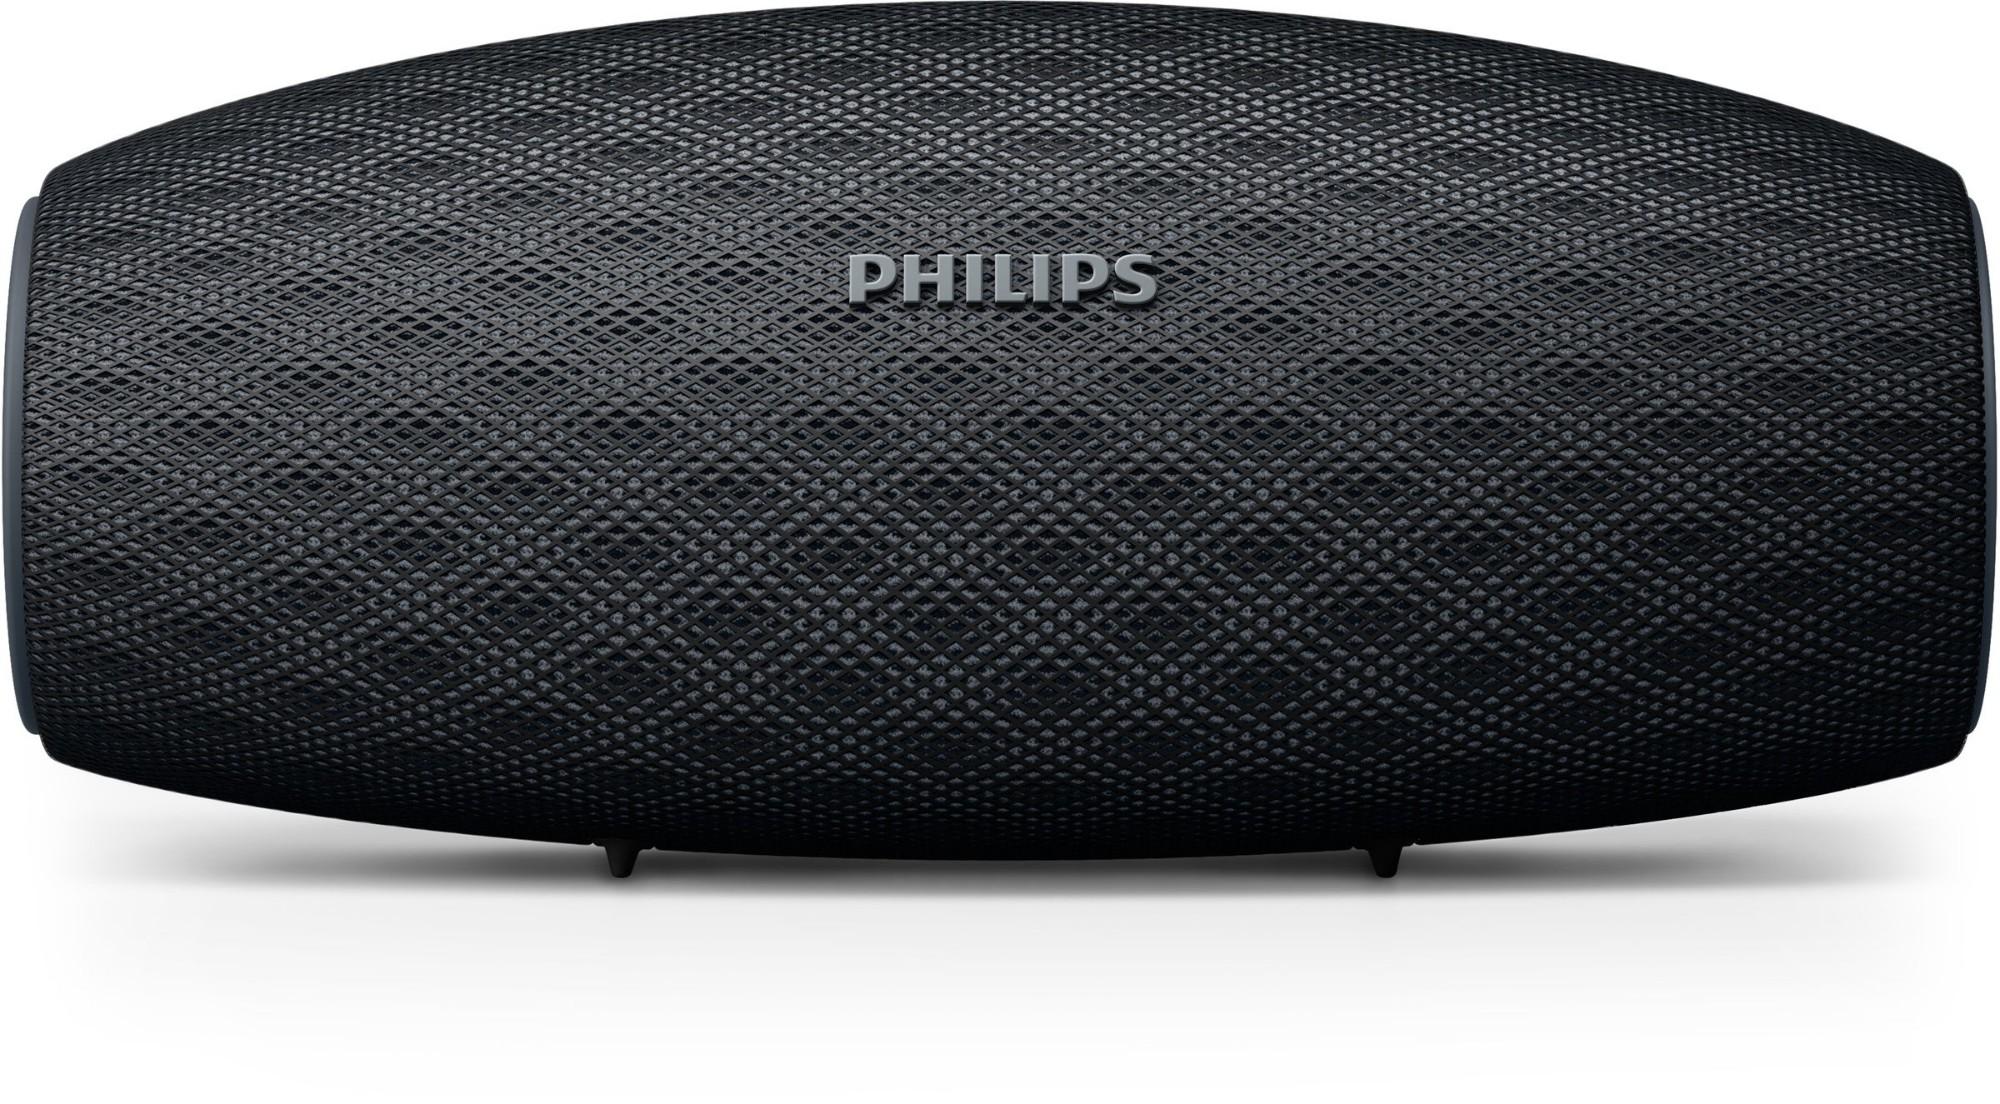 Philips wireless portable speaker BT6900B/00